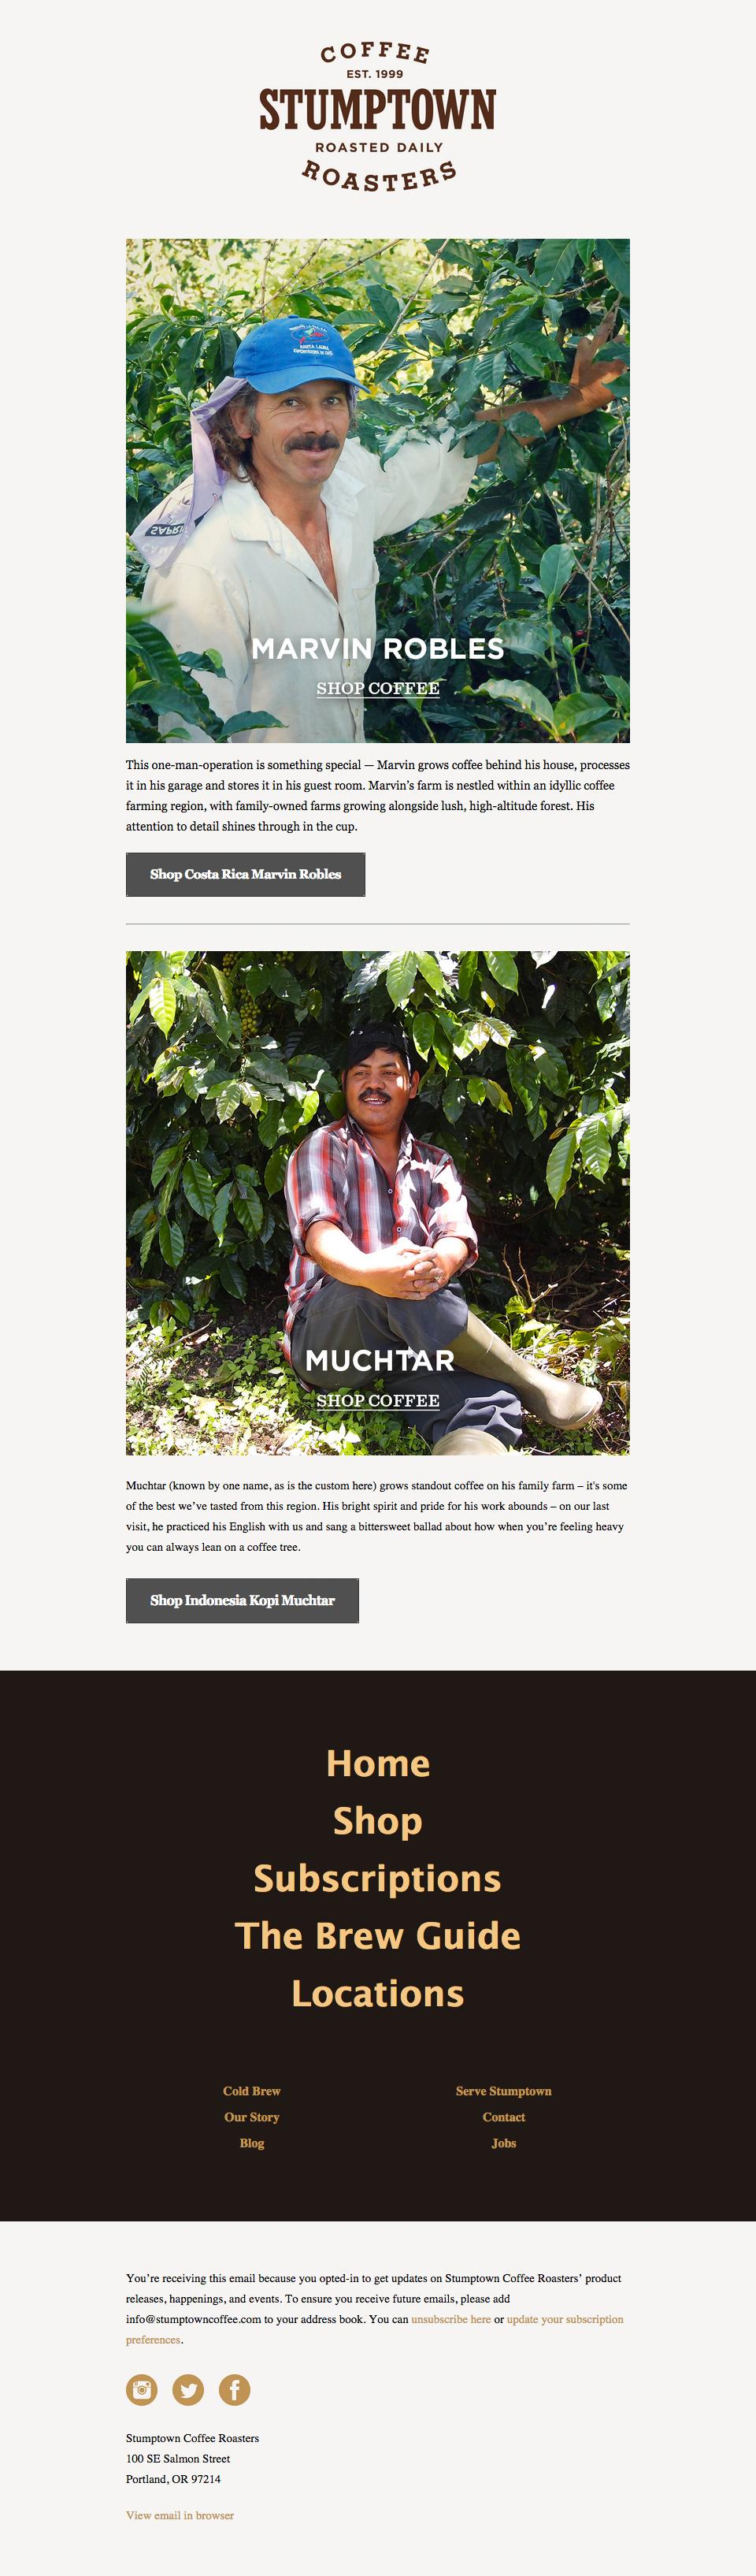 stumptown-coffee-newsletter